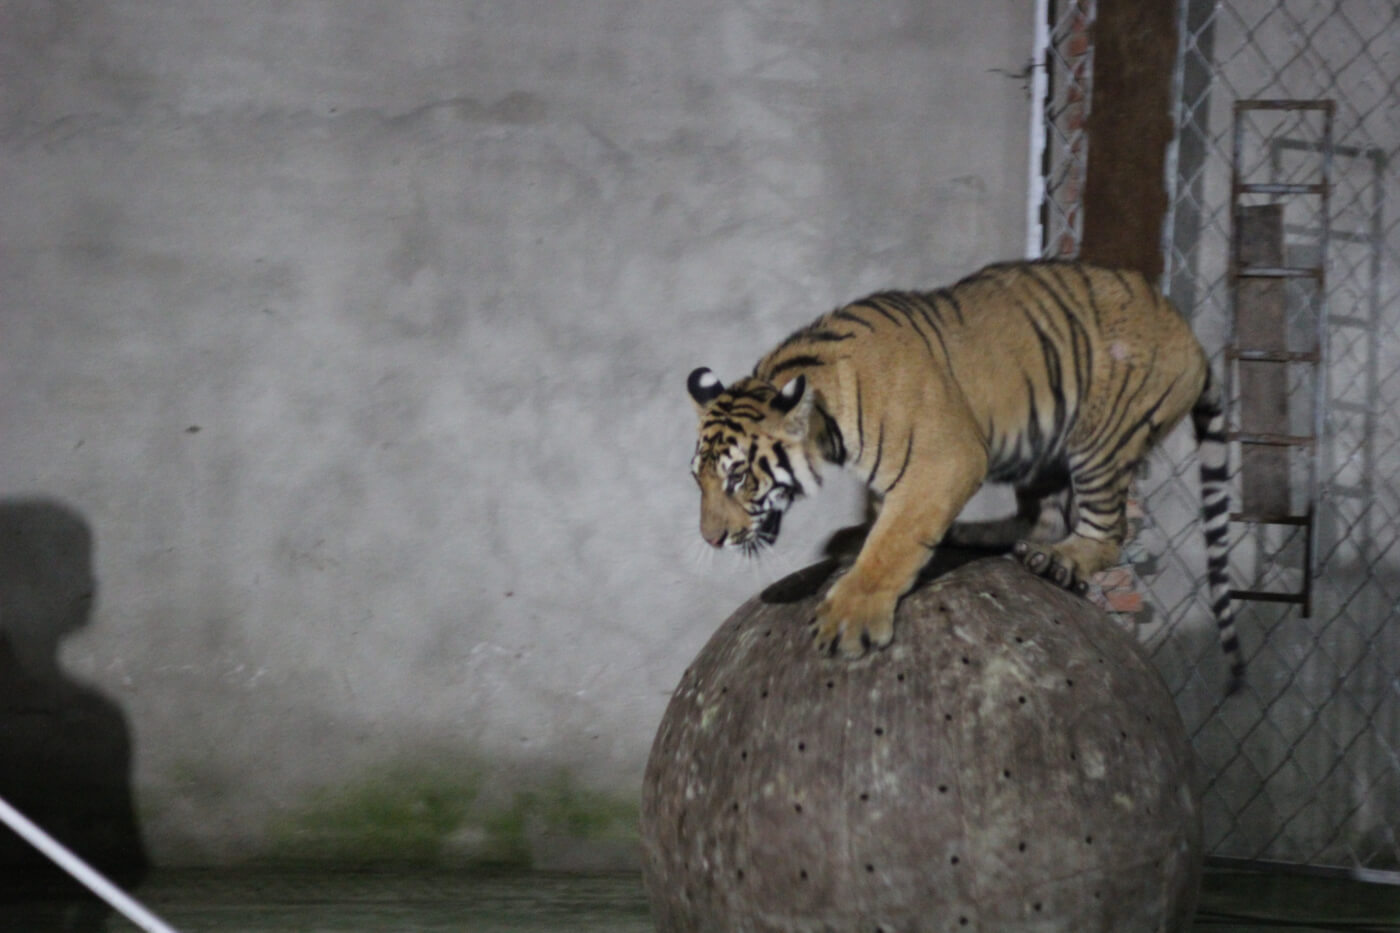 Tiger balancing on ball in circus